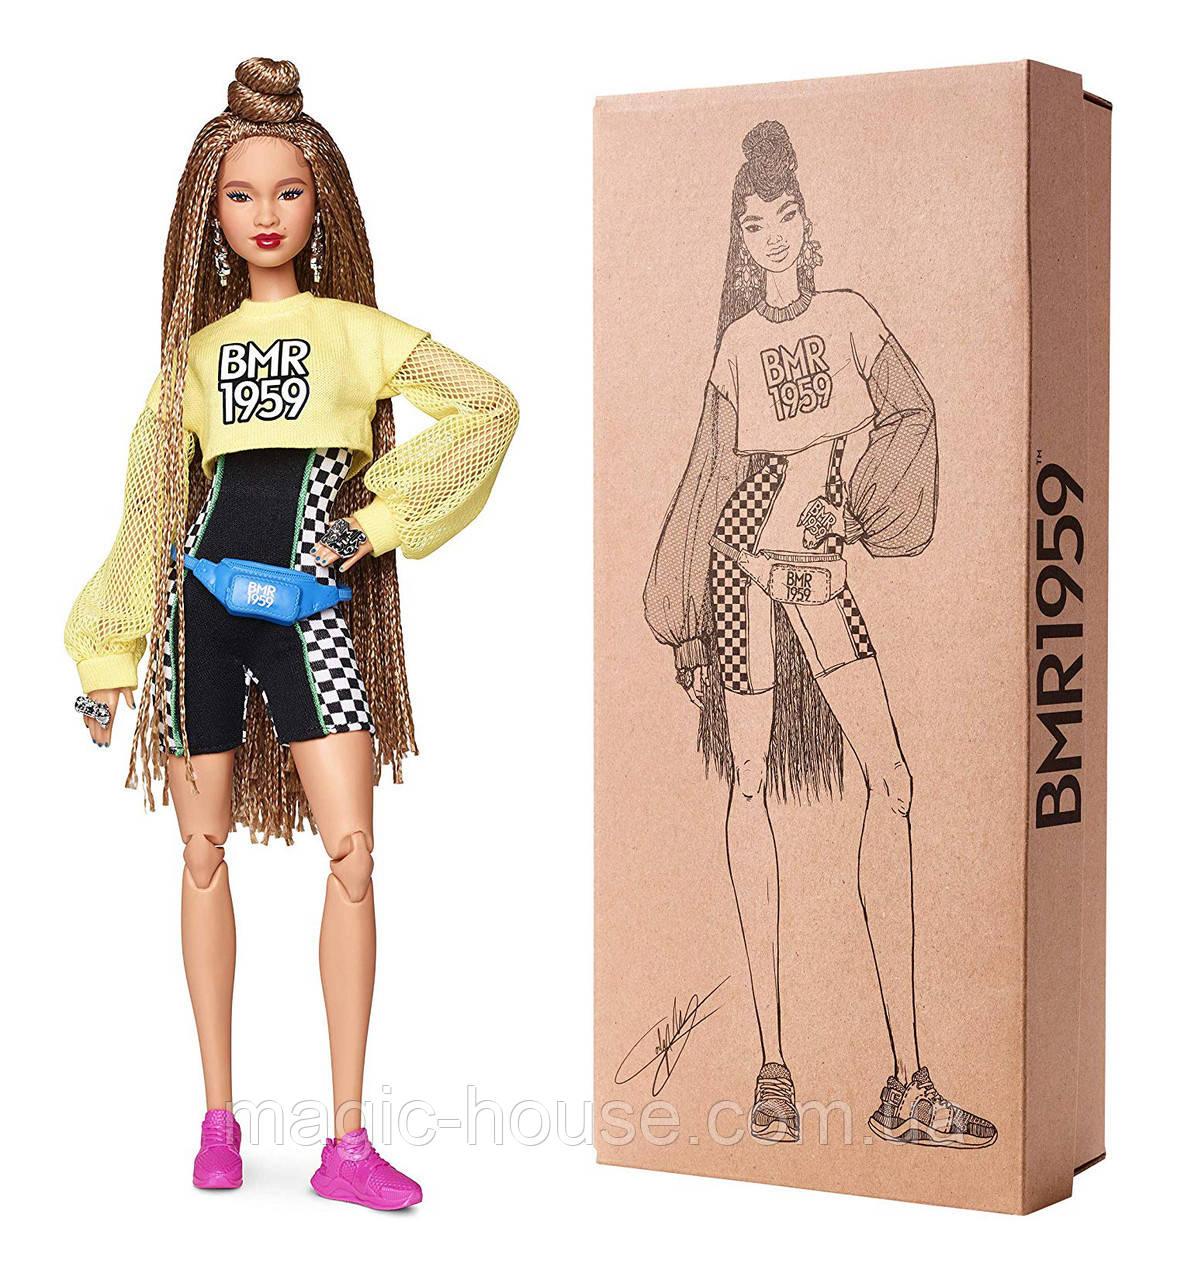 Кукла Барби Barbie BMR1959 Fully Poseable Fashion Doll оригинал от Mattel